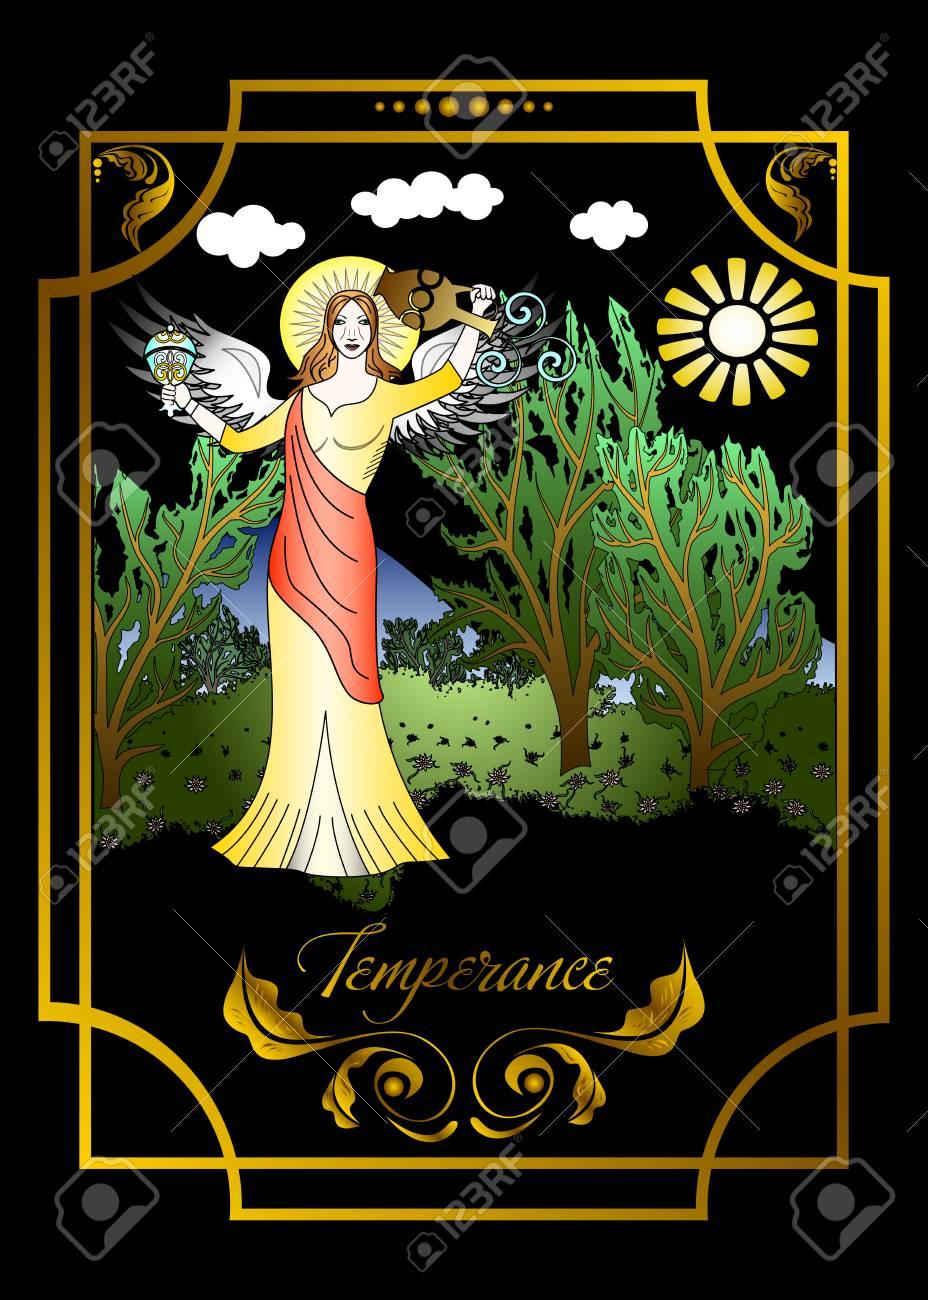 Suit of the temperance, tarot card illustration